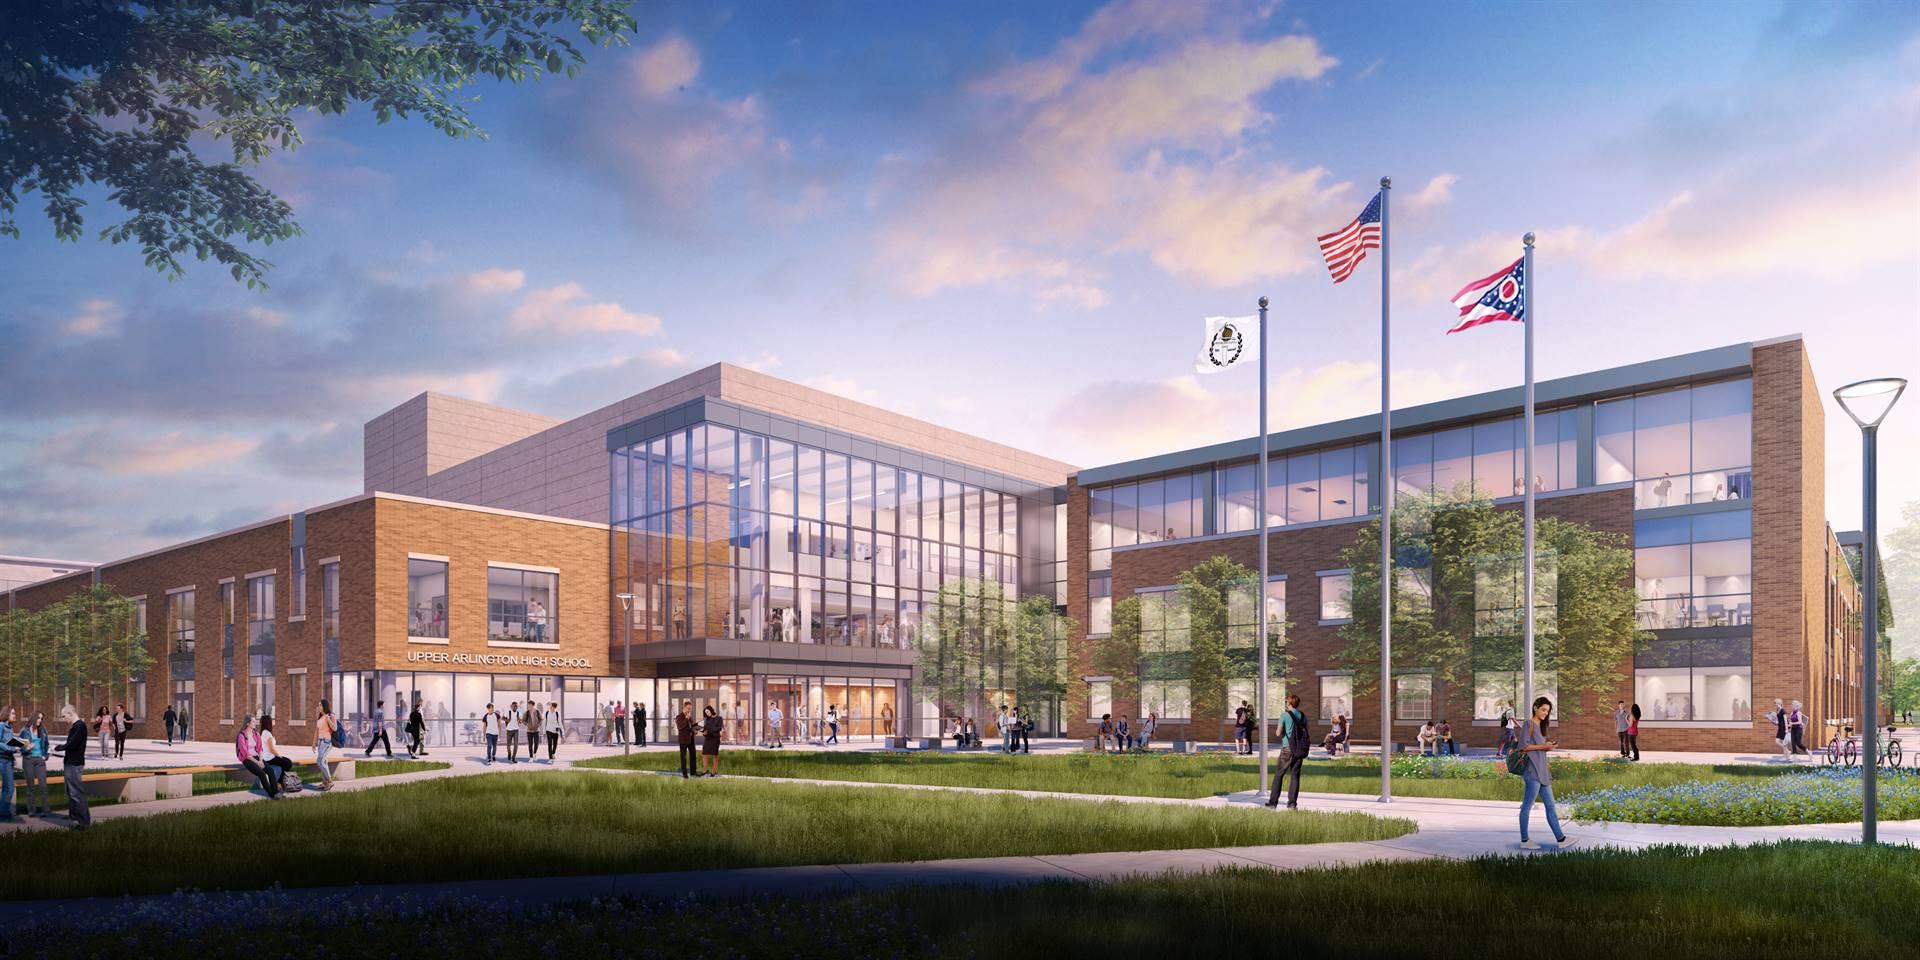 Final design plan for the new Upper Arlington High School